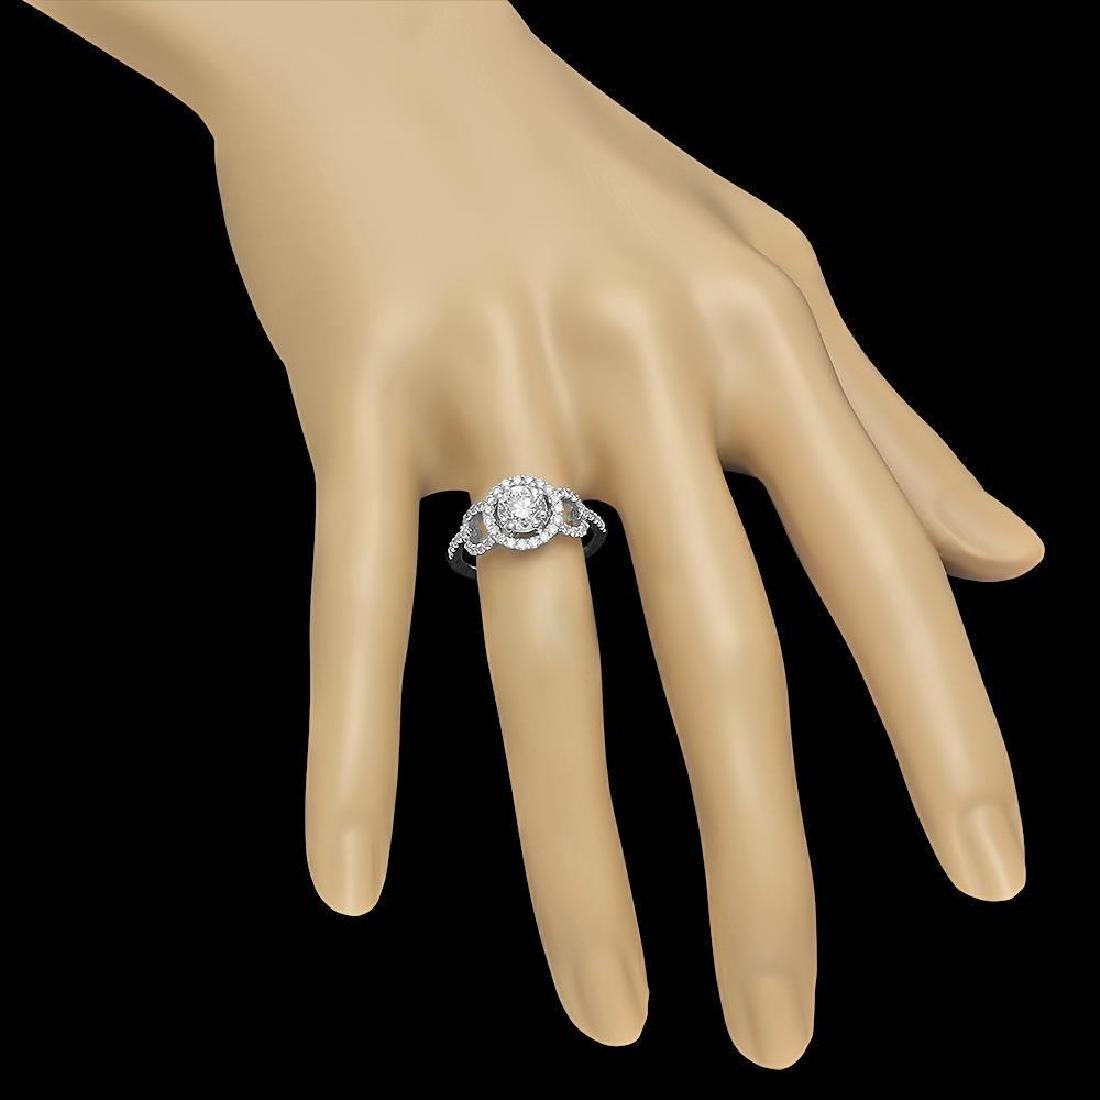 14K Gold 1.44ct Diamond Ring - 3